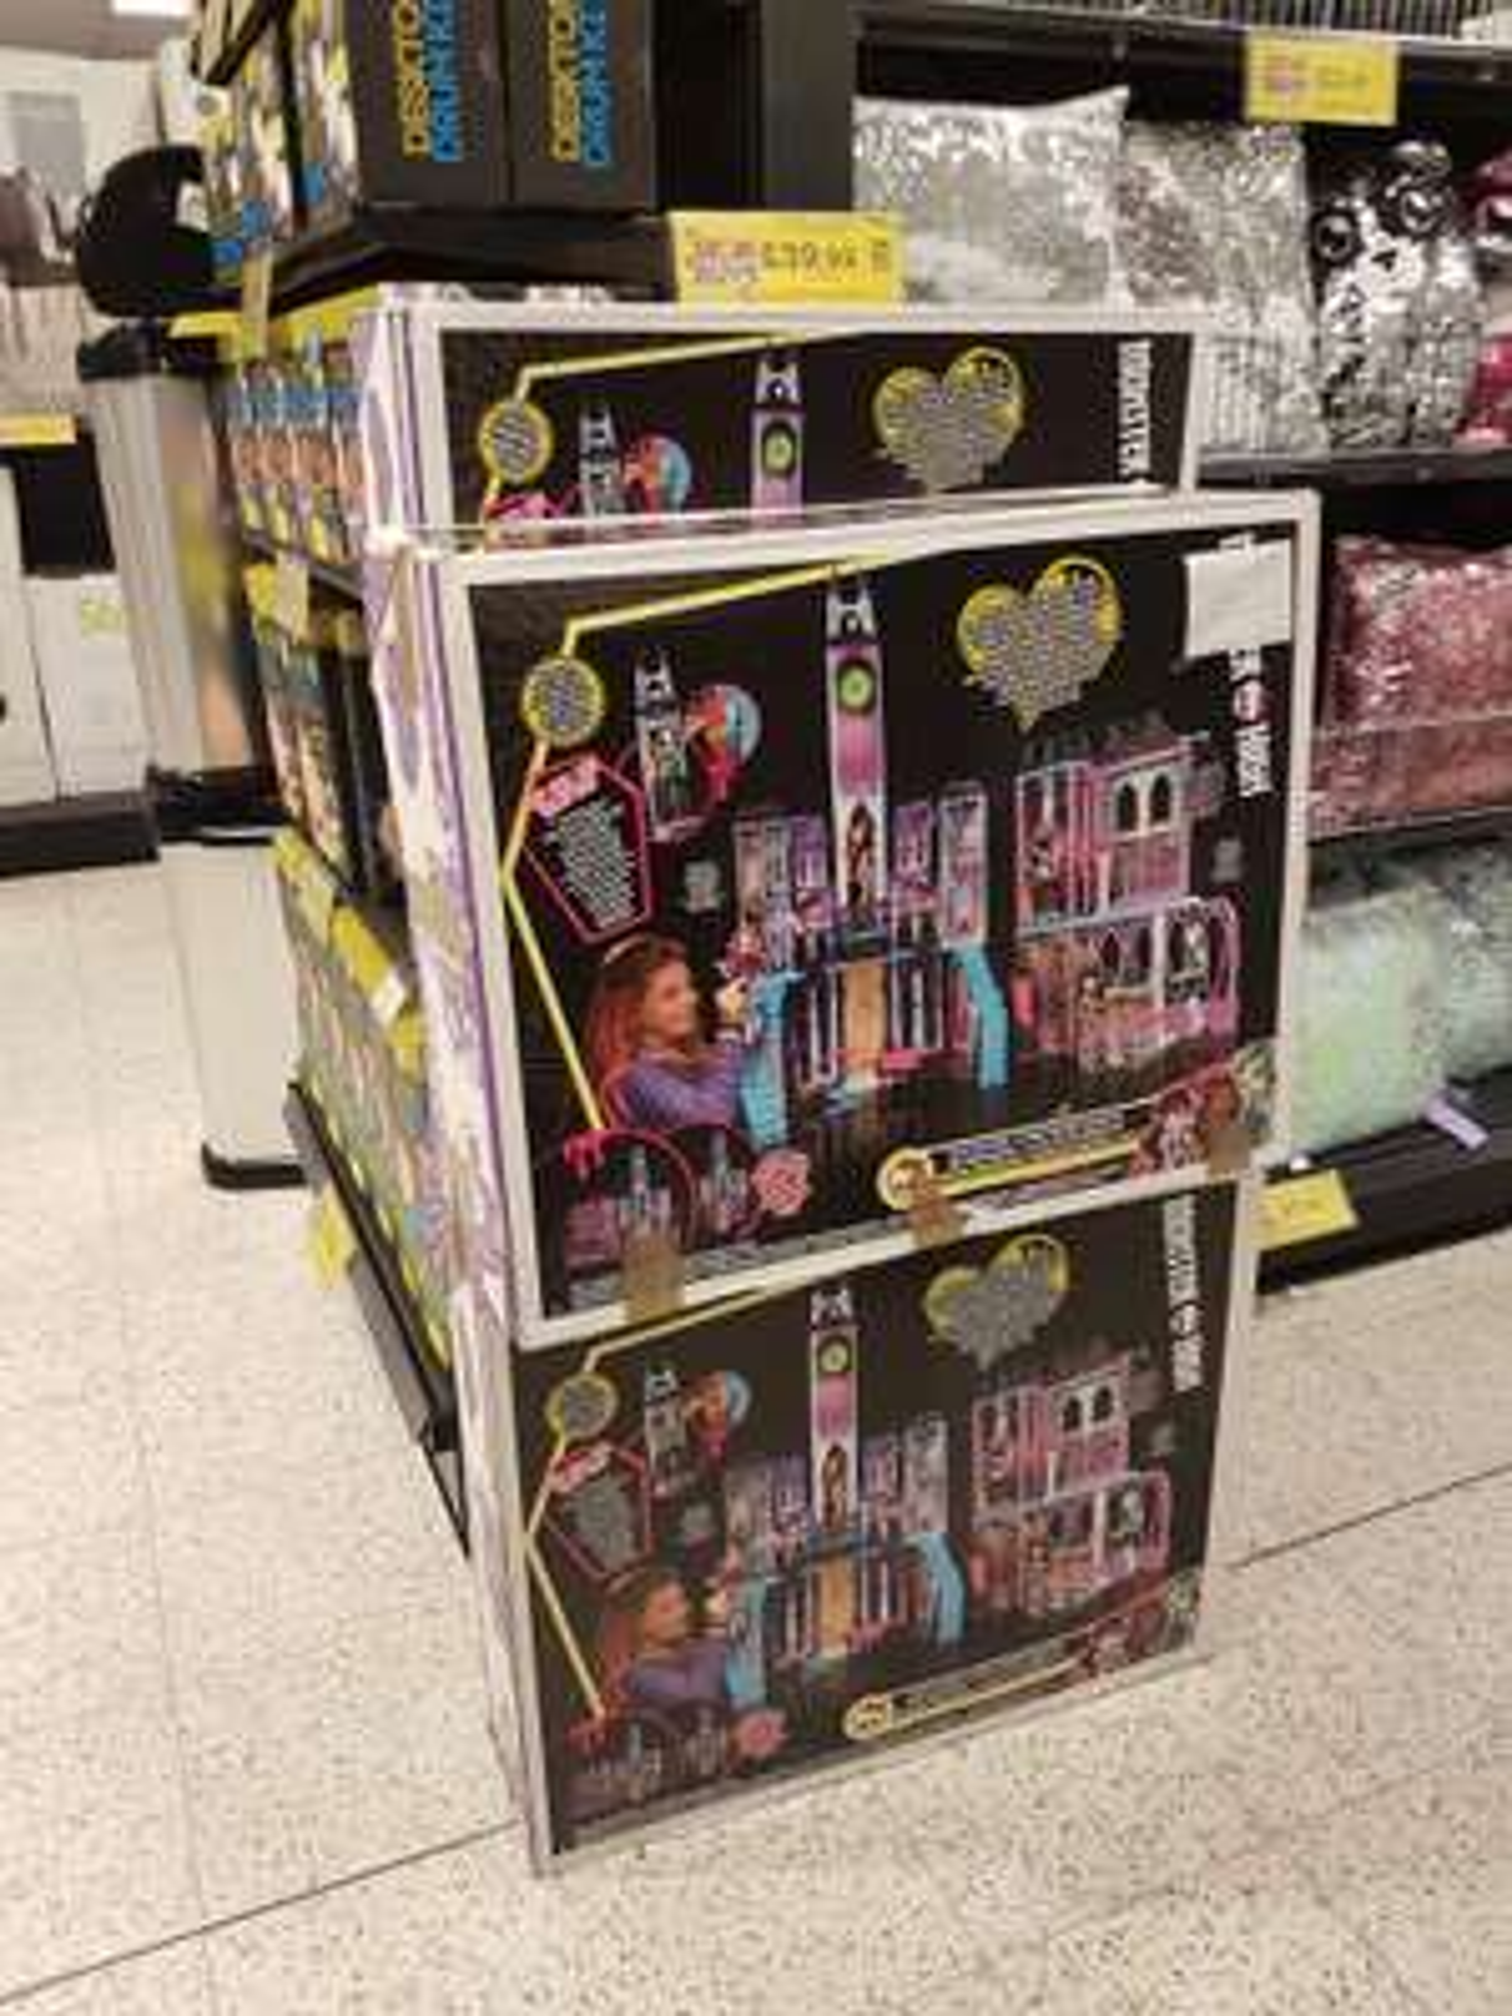 Monster High Deadluxe School Home bargains - £39.99 instore